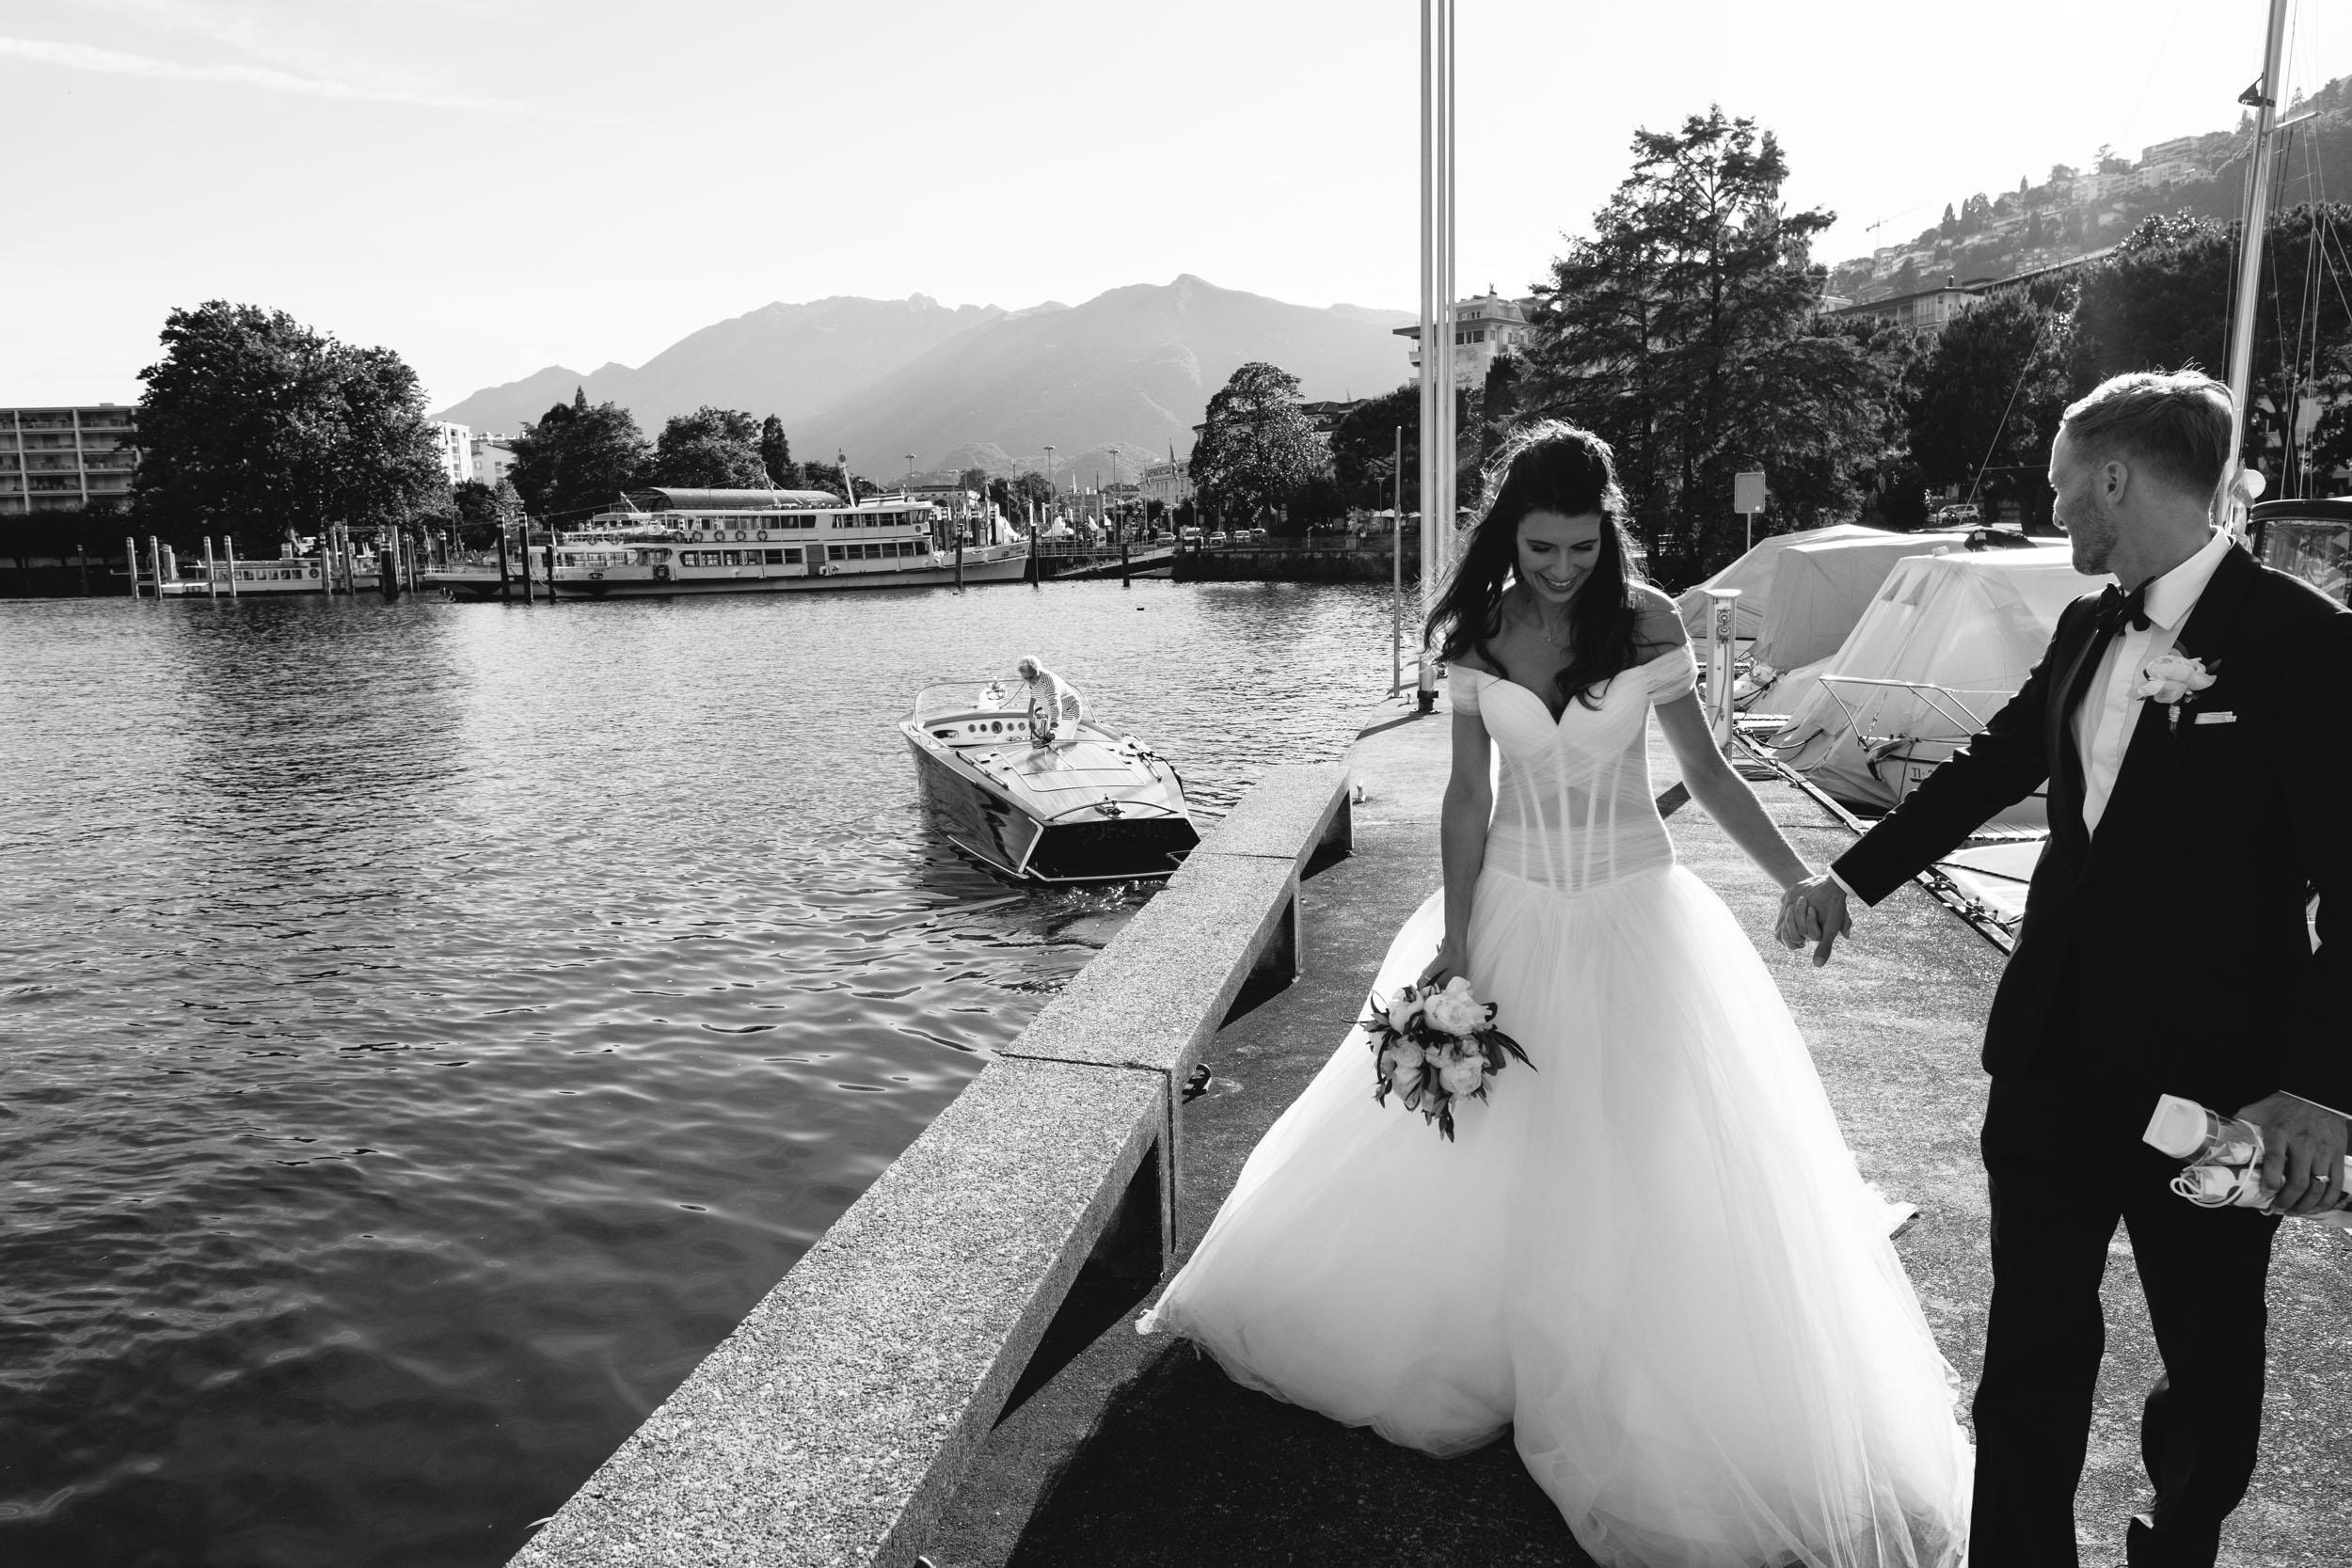 olivia-andreas-wedding-switzerland-447.jpg